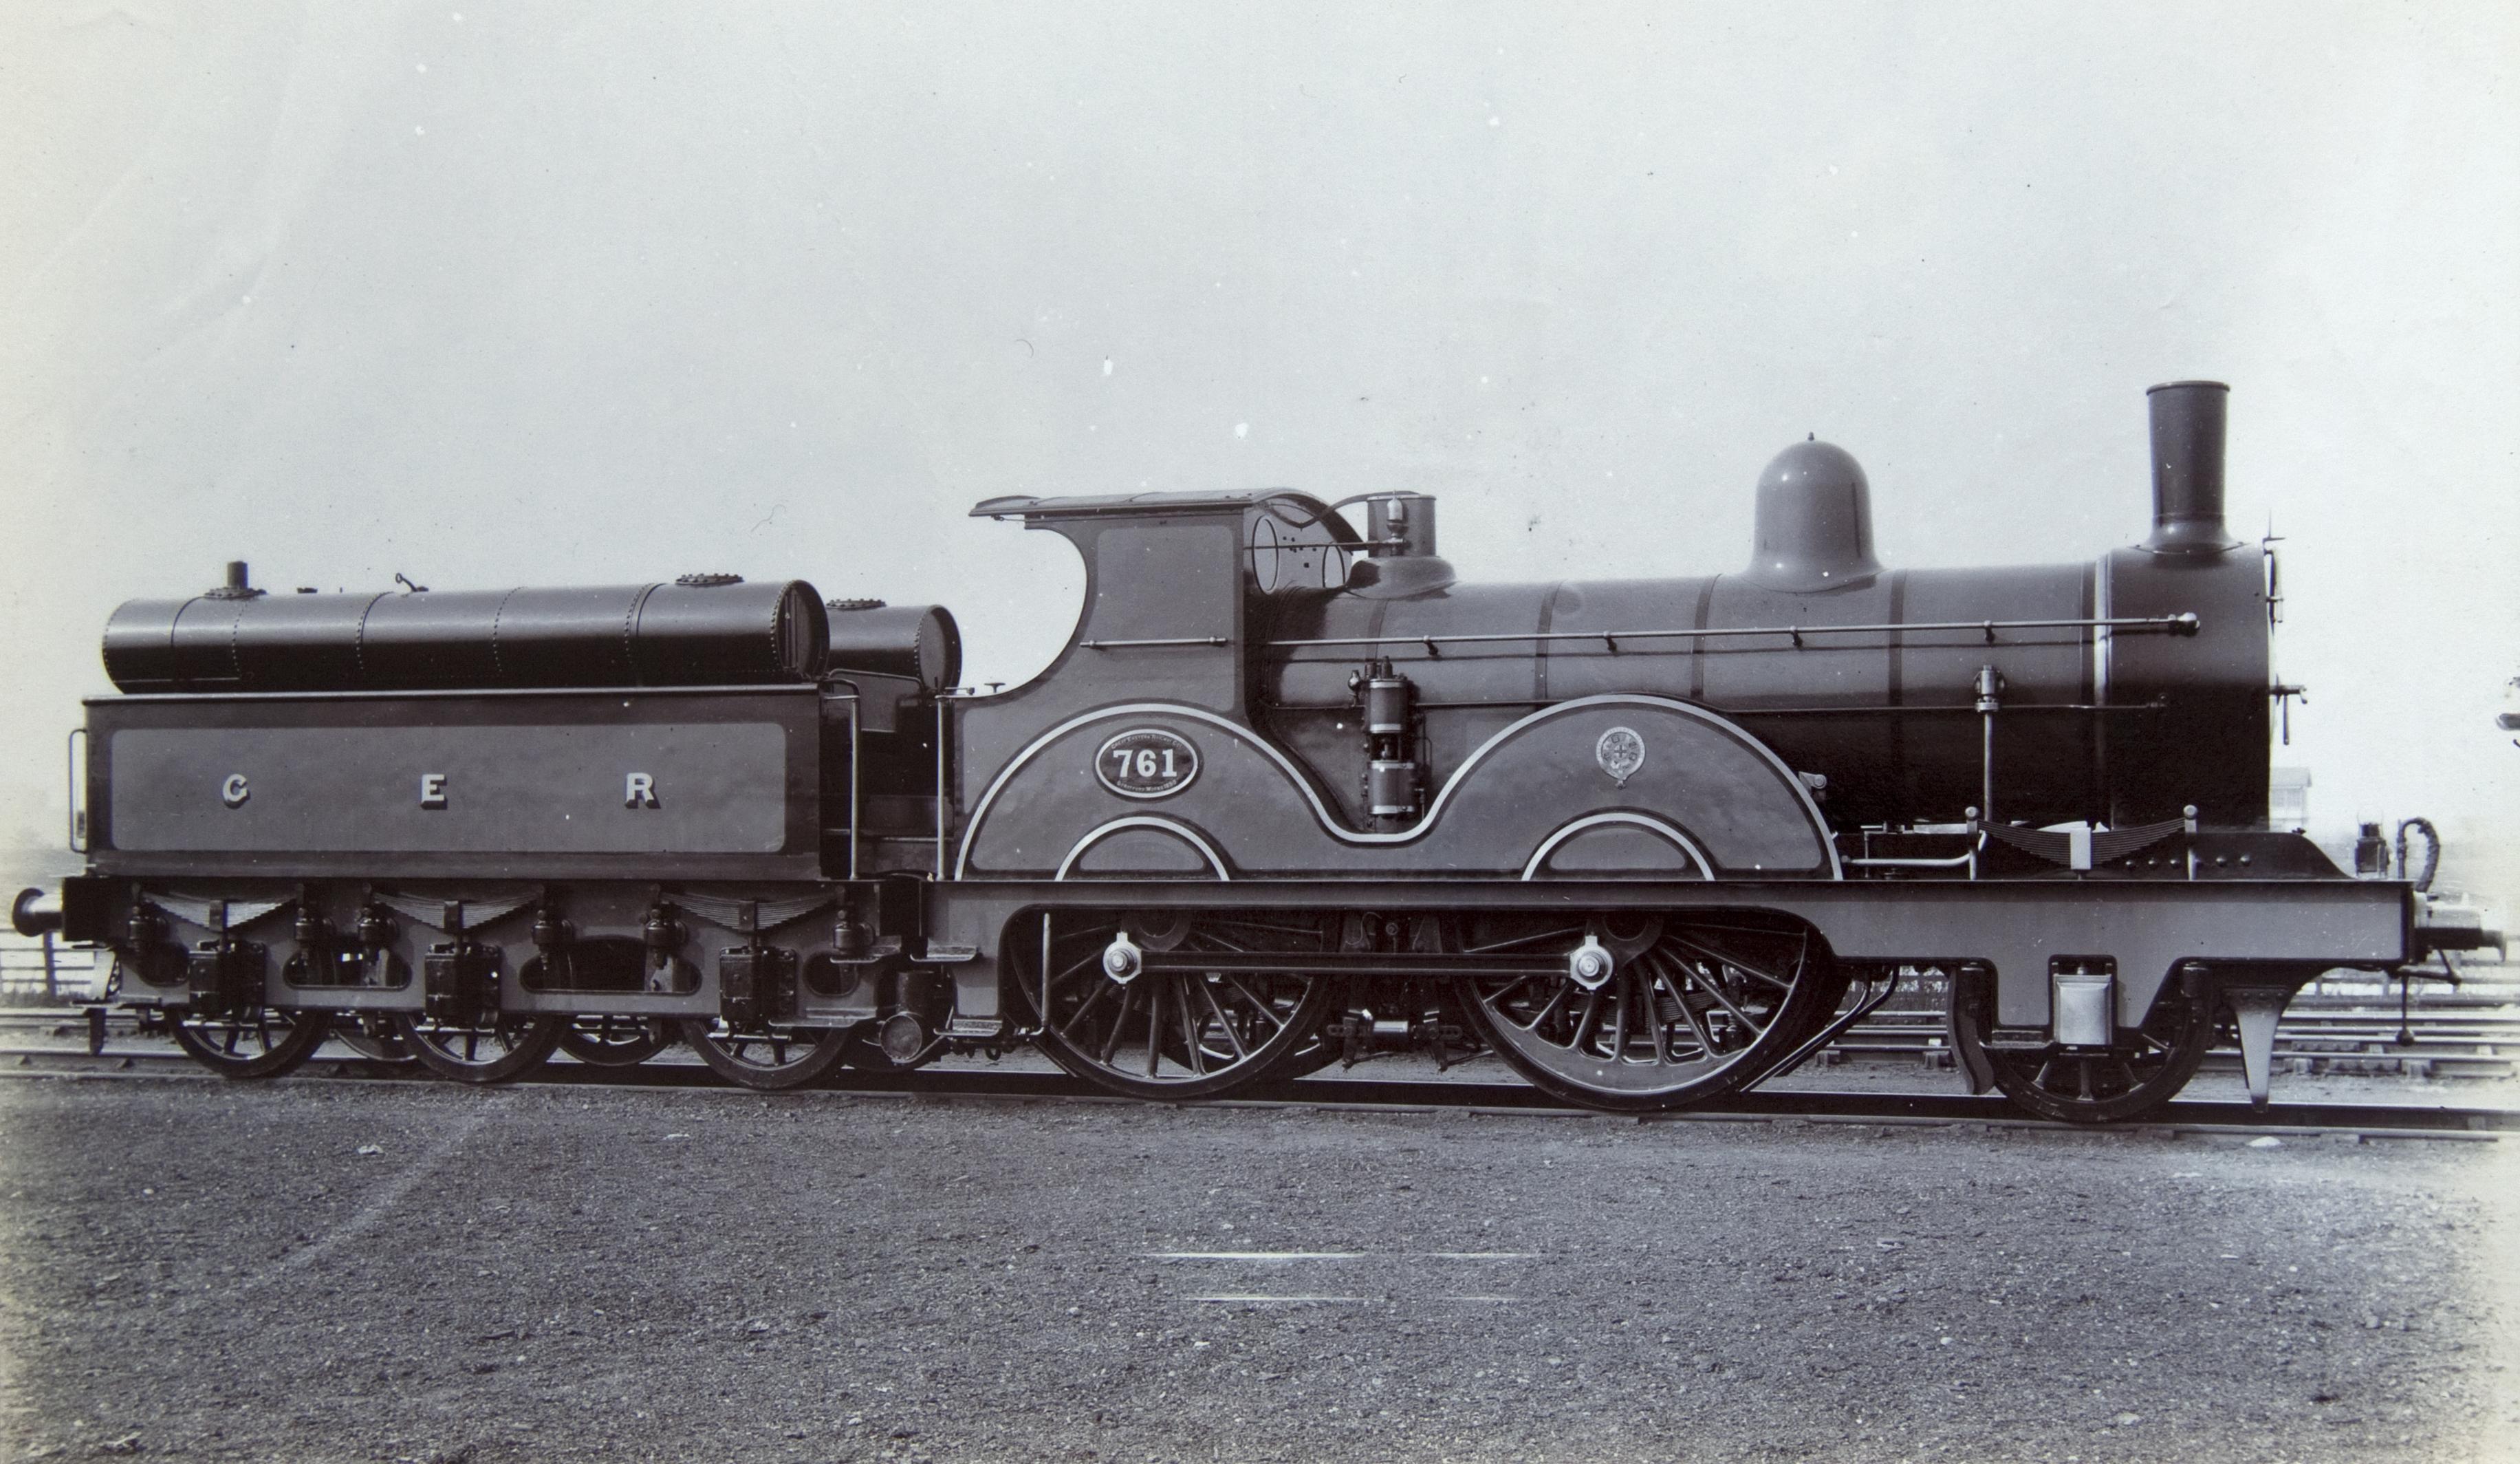 File:2-4-0 GER T19 class 761.jpg